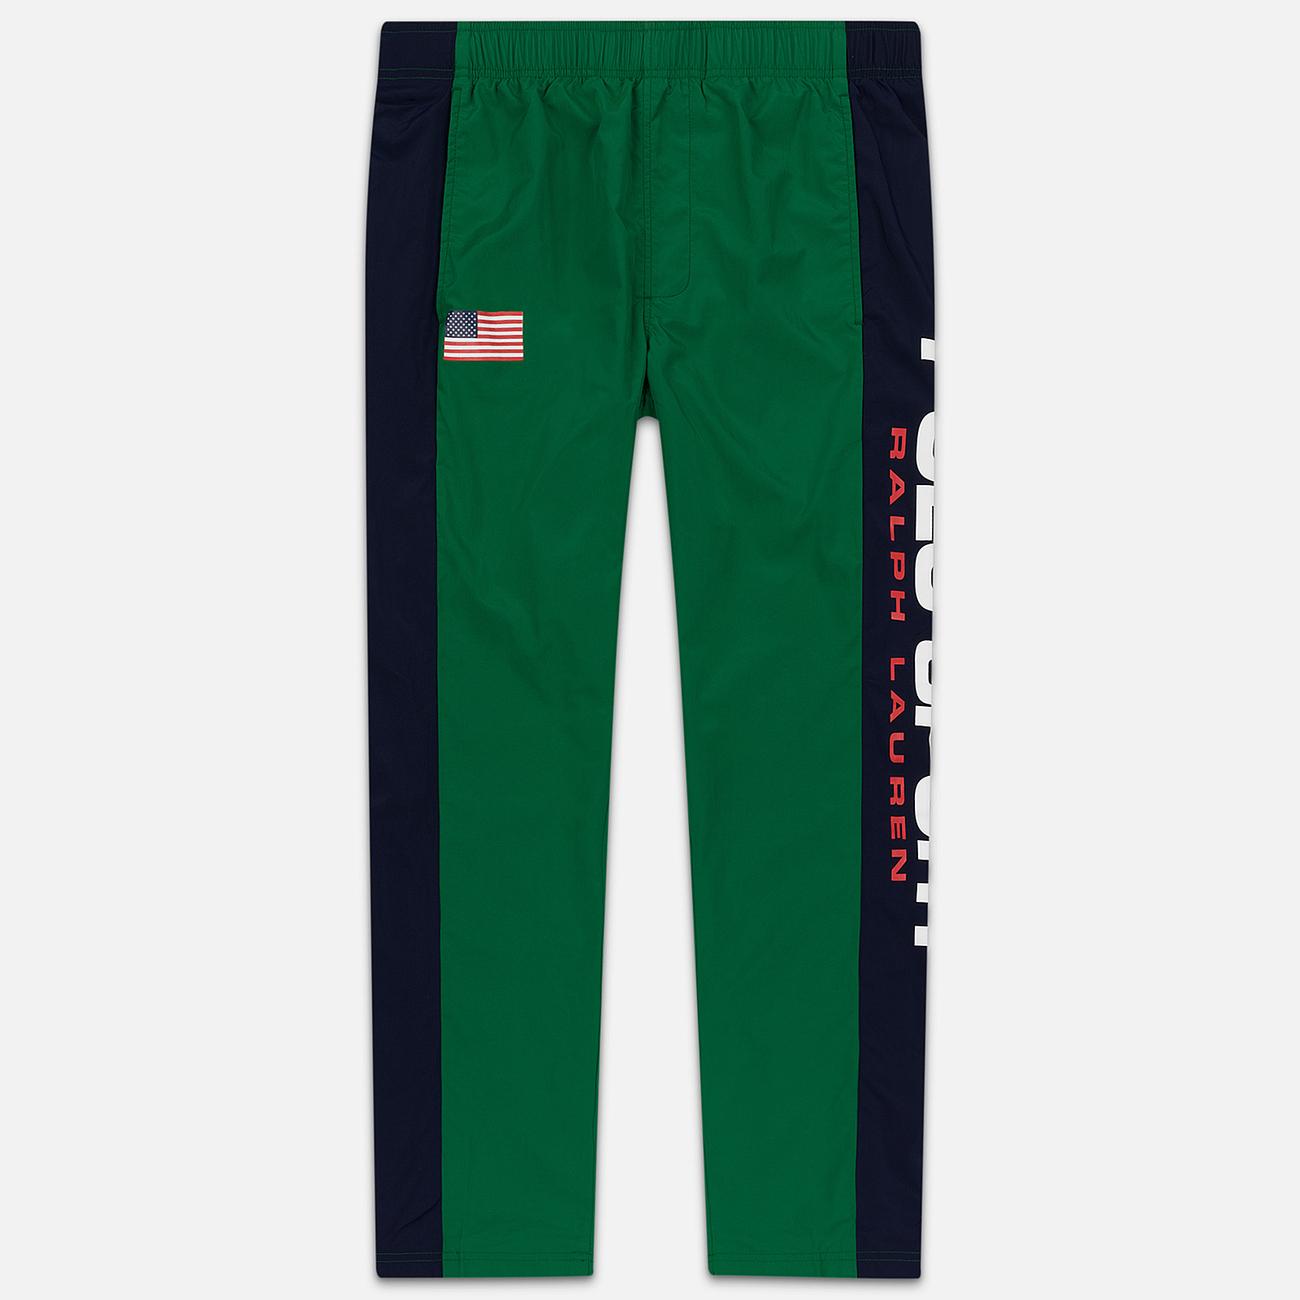 Мужские брюки Polo Ralph Lauren Polo Sport Freestyle Nylon OG Pull Up Jerry Green/Cruise Navy